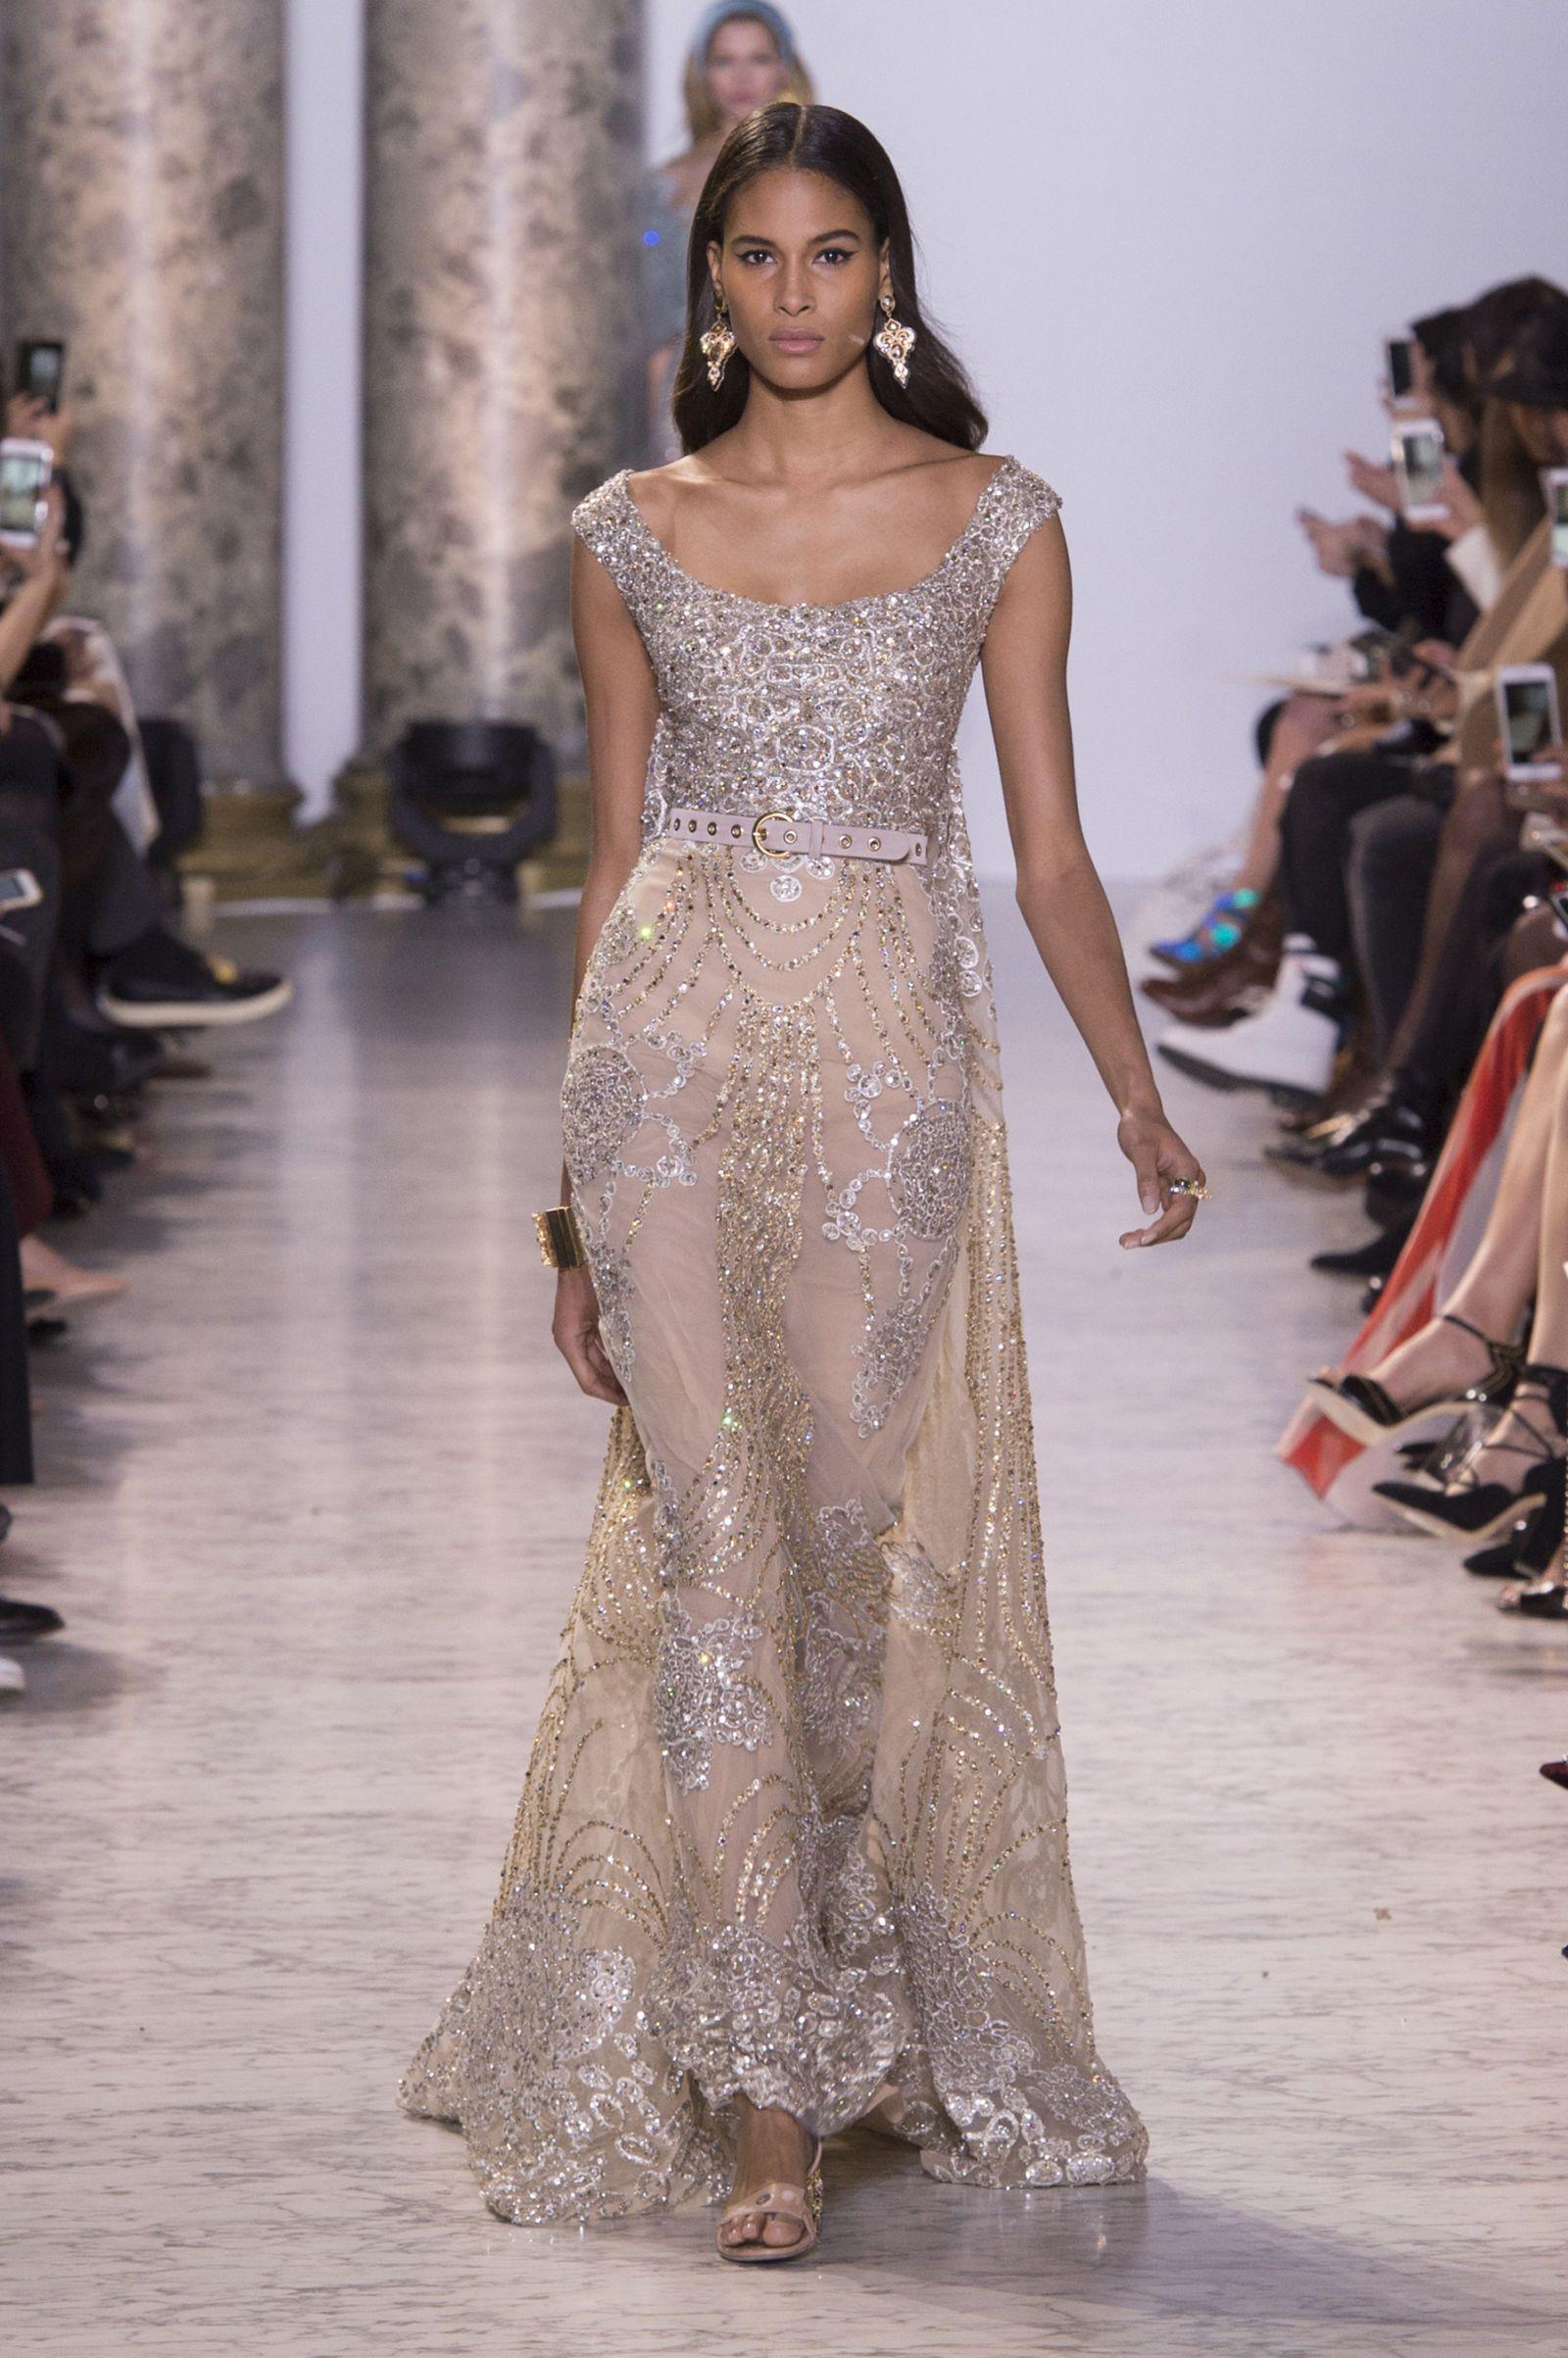 Saab elie couture